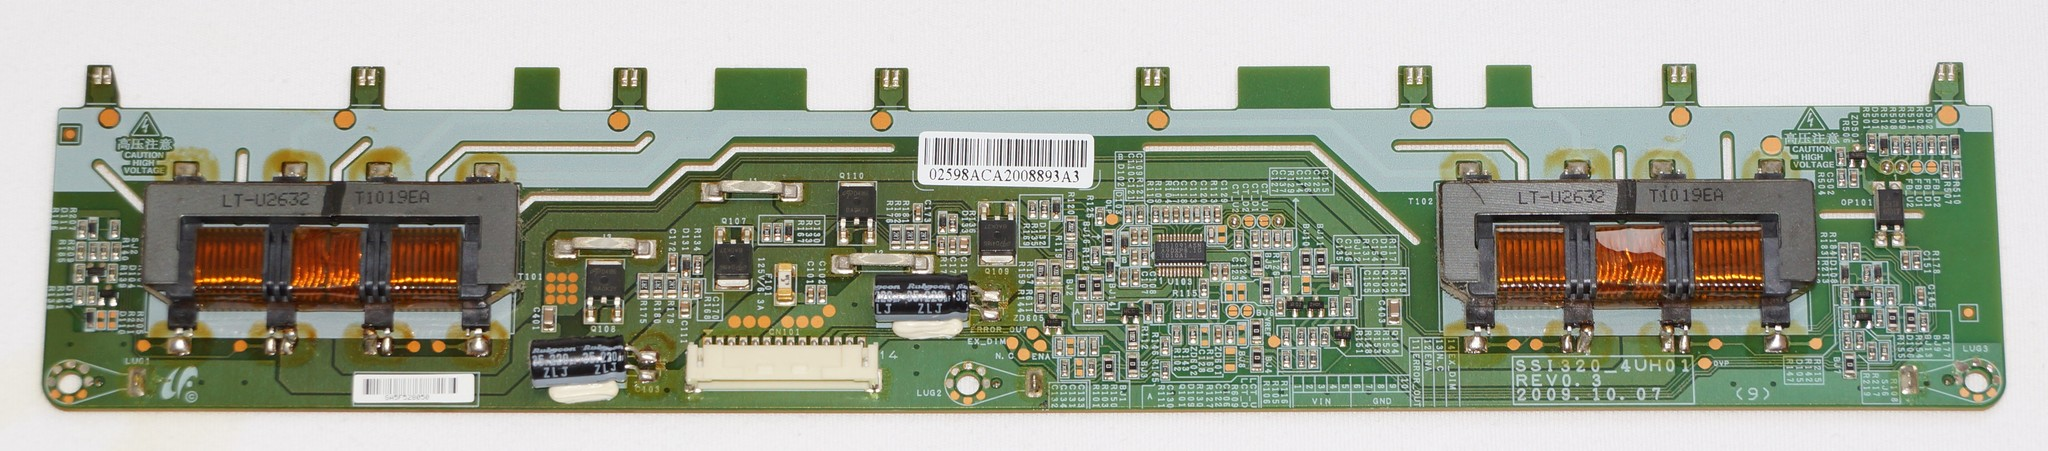 SSI320_4UH01 REV0.3 инвертор телевизора Samsung